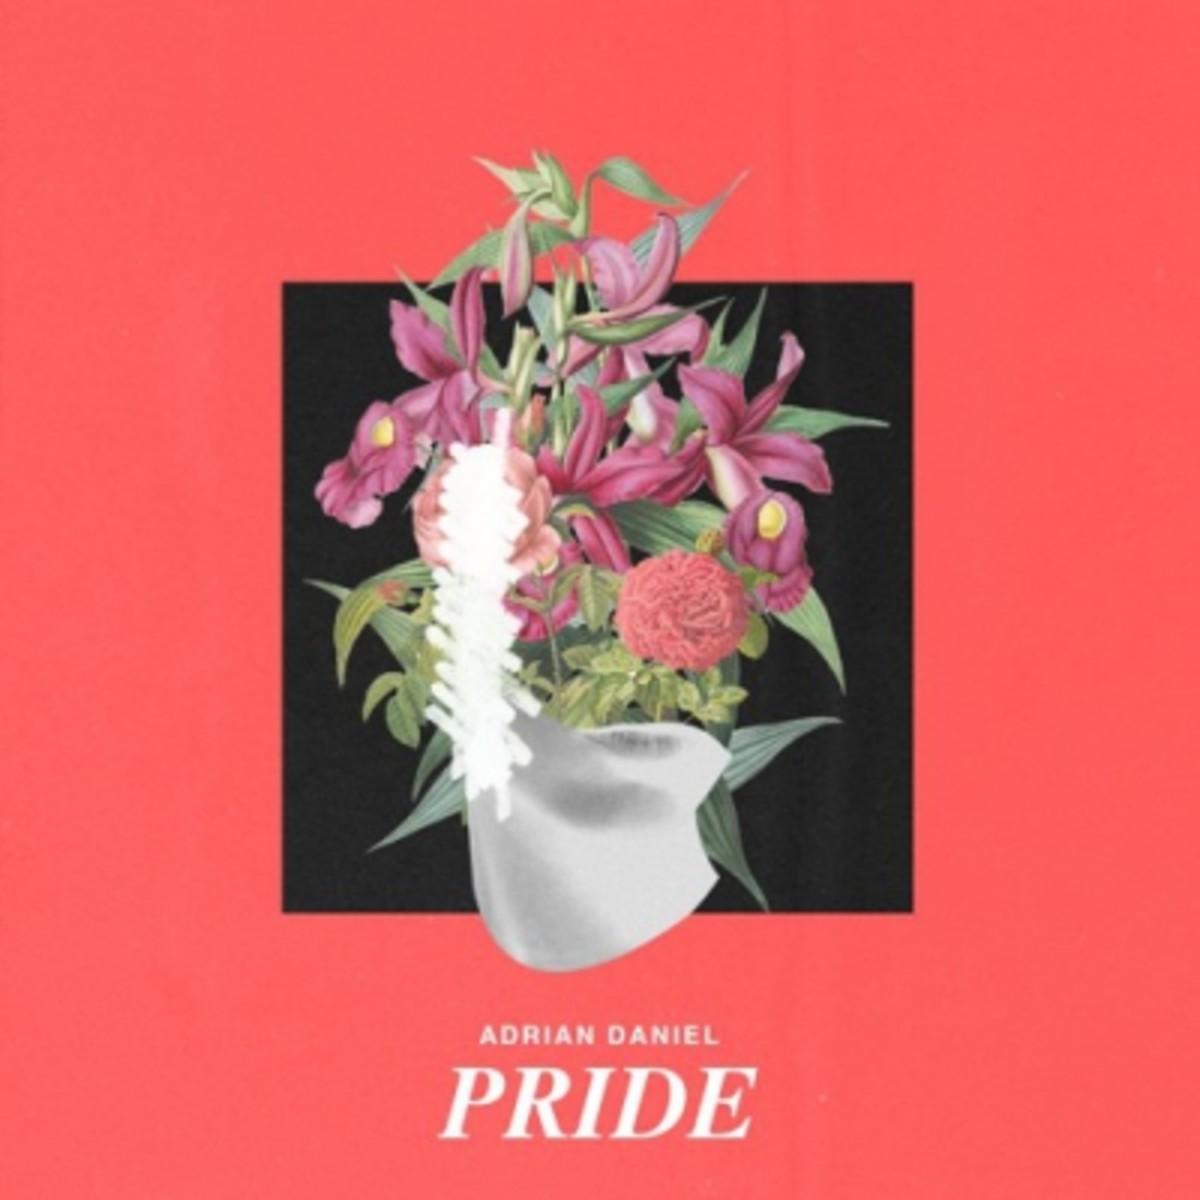 adrian-daniel-pride.jpg